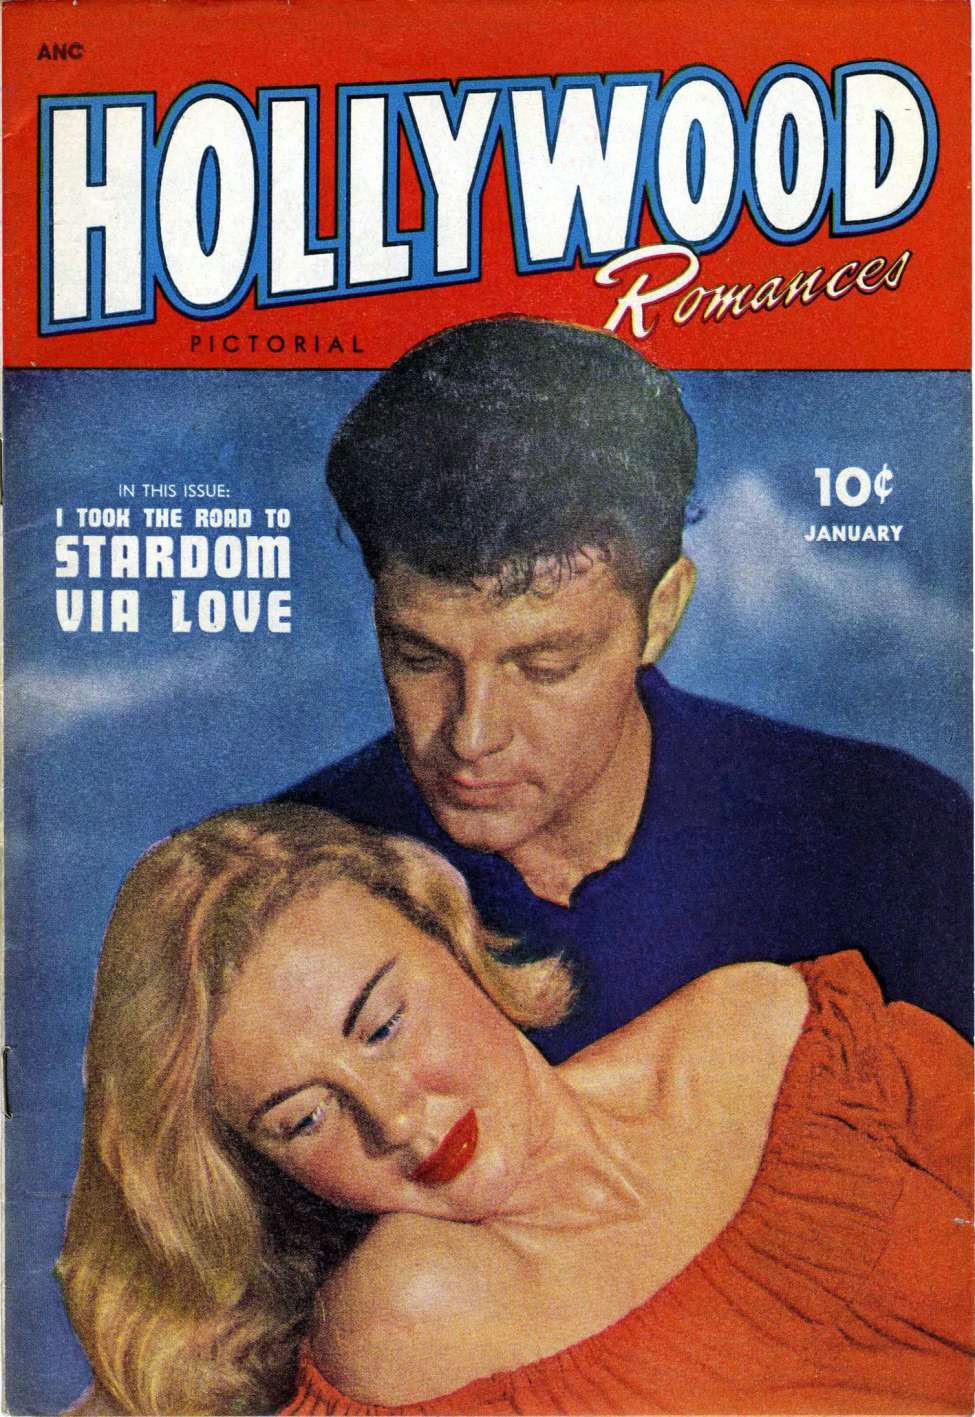 Hollywood Pictorial Romances #3, St. John